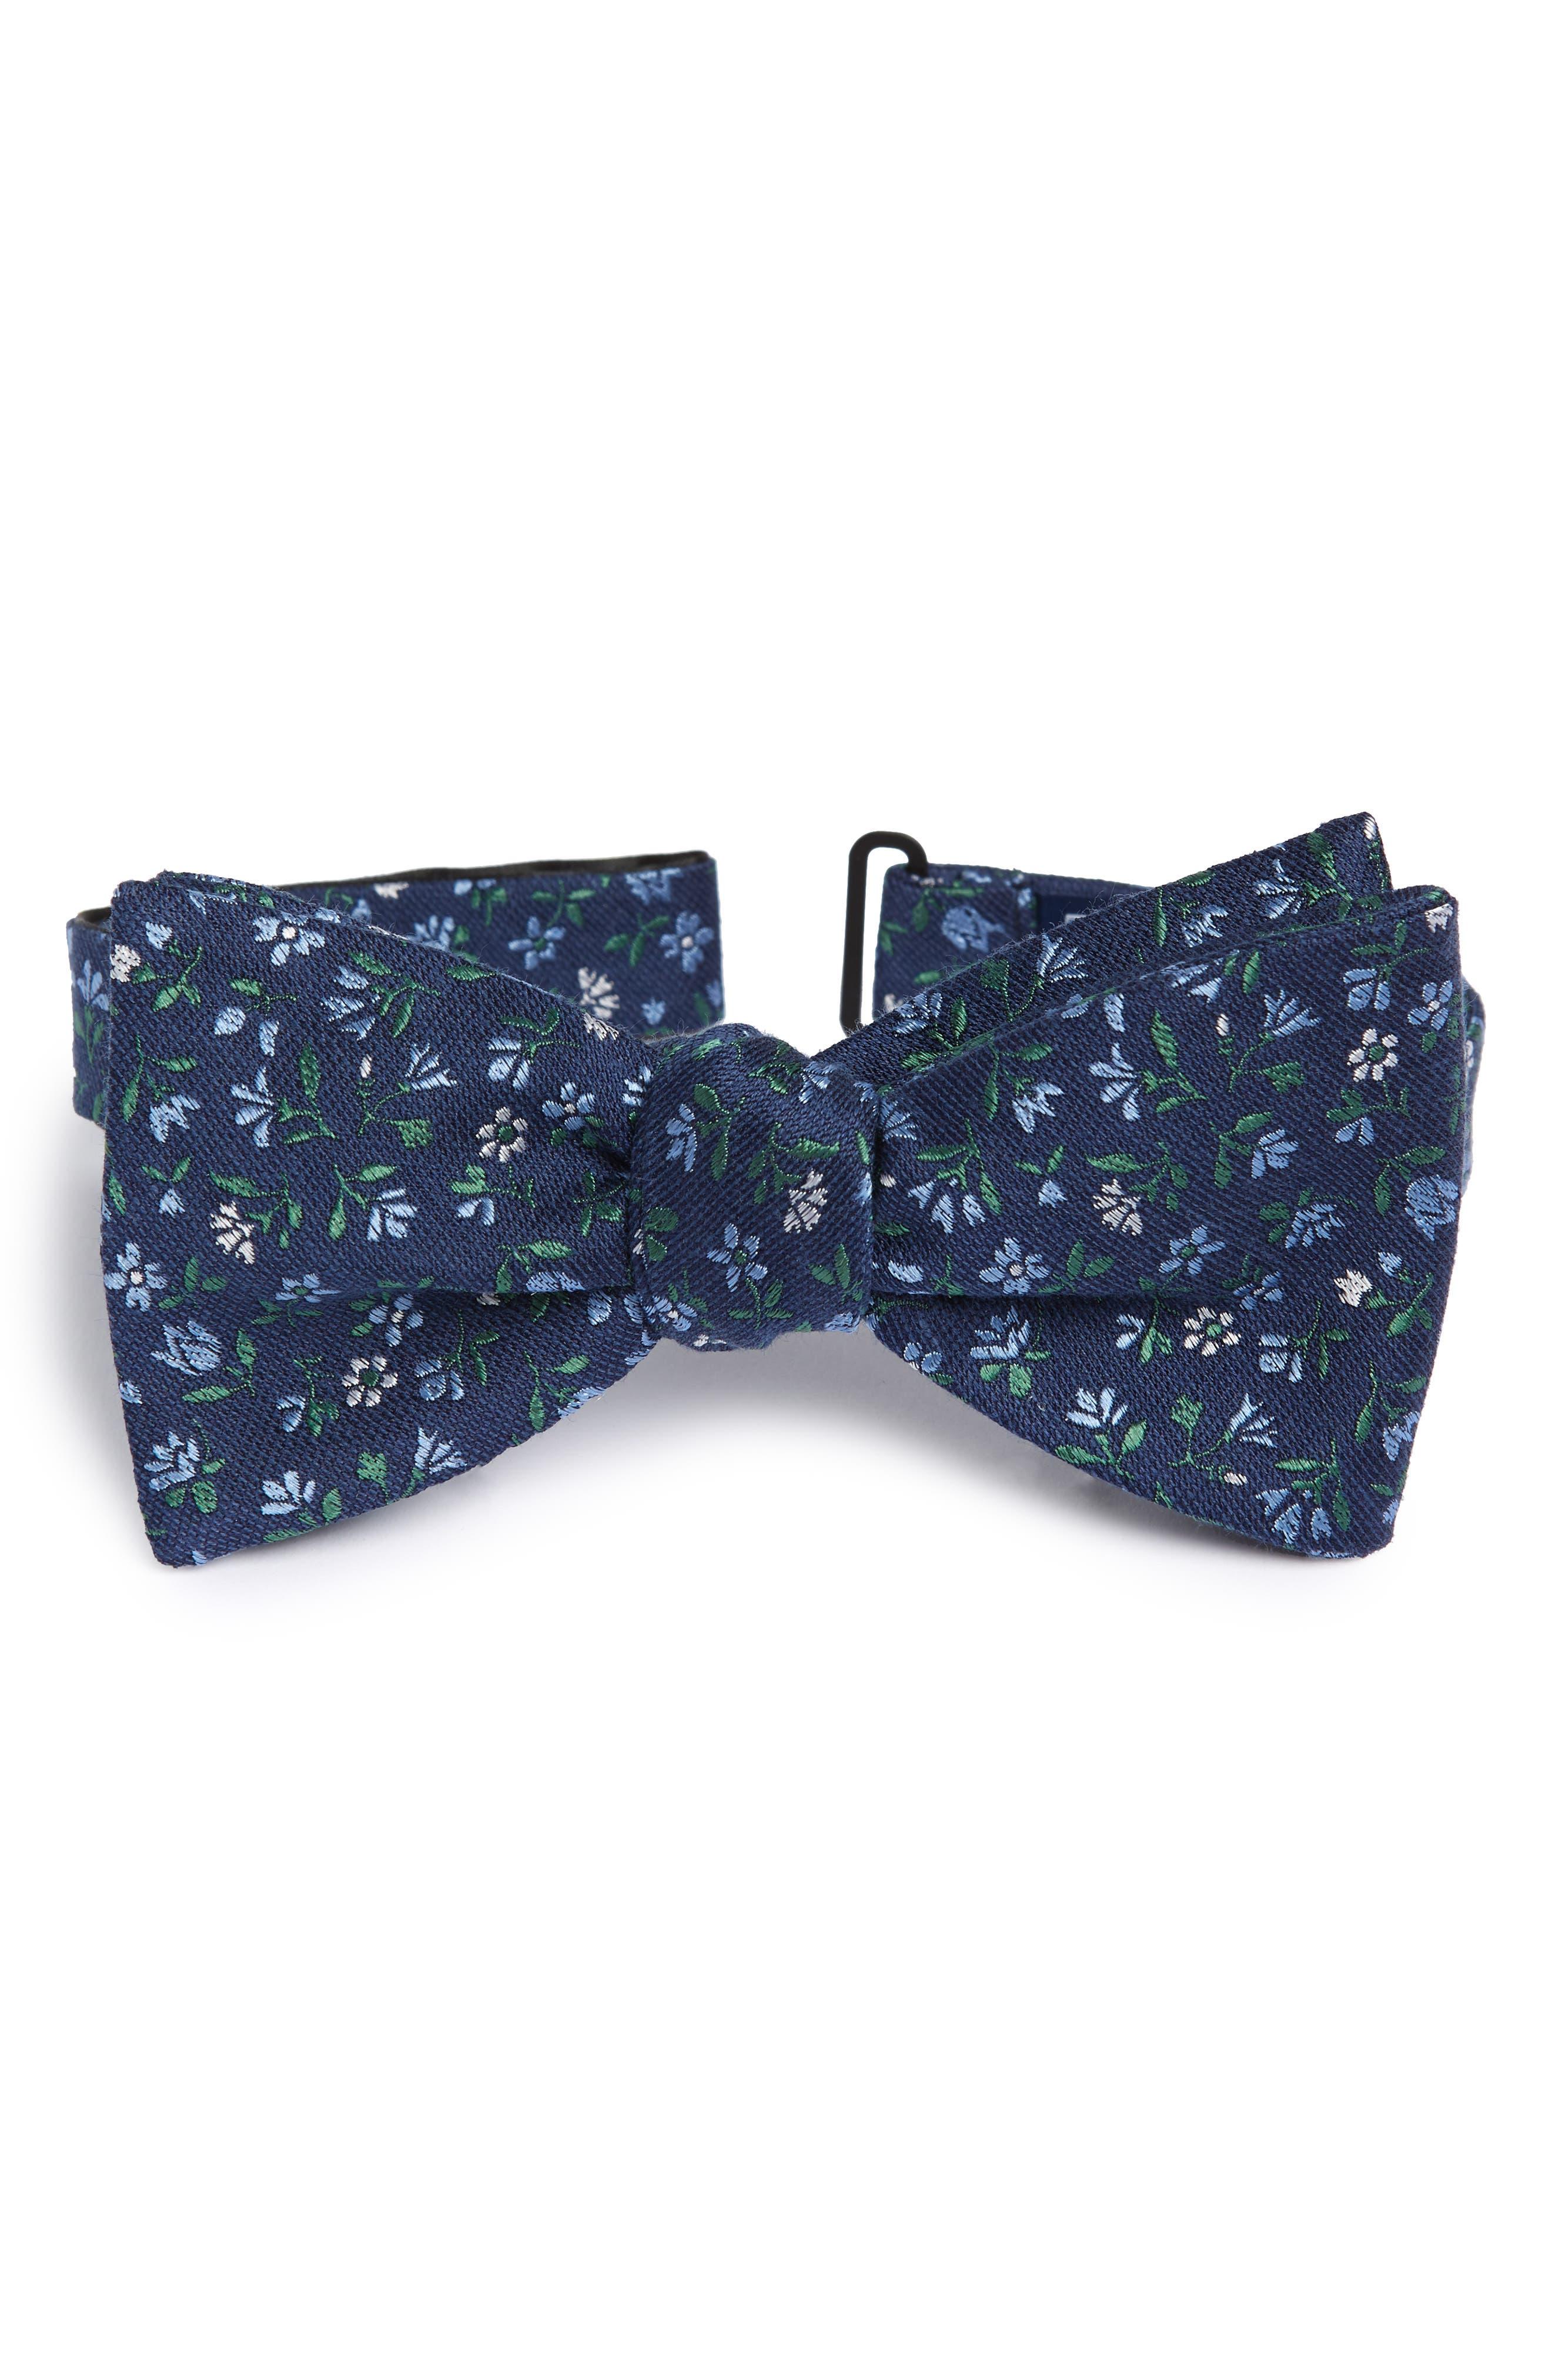 Floral Acres Bow Tie,                         Main,                         color, Navy